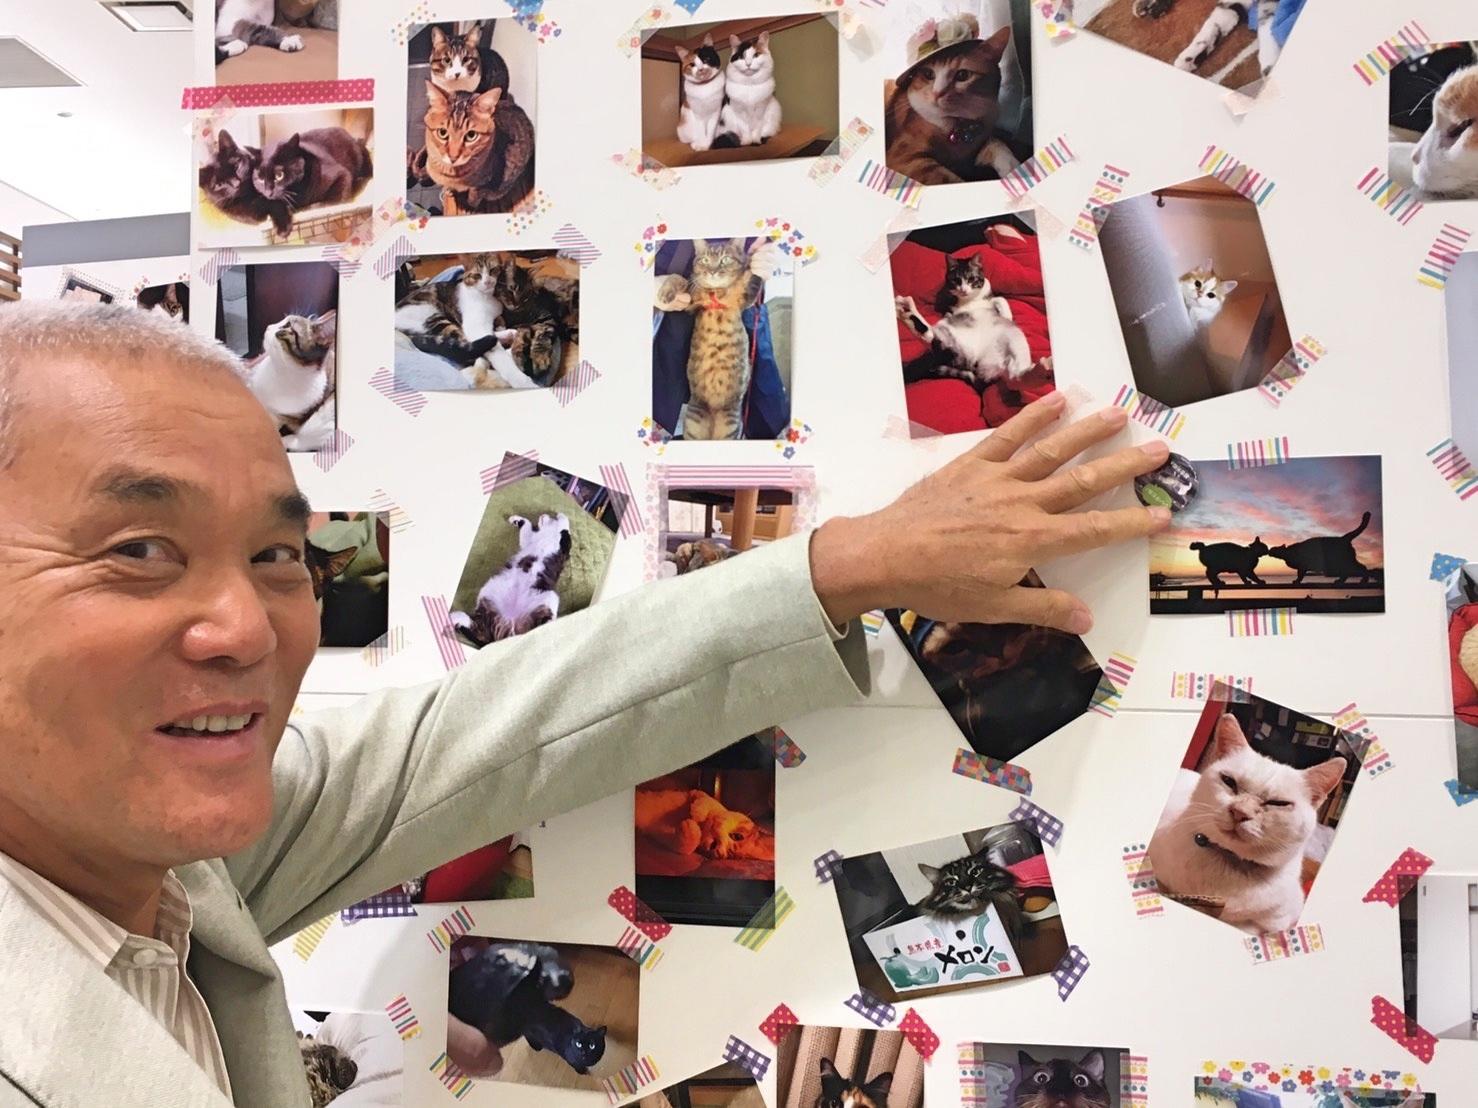 「PECO NEKO館」に岩合さんがご来館! 福岡三越全館「ねこ・猫・ネコづくし」絶賛開催中♪